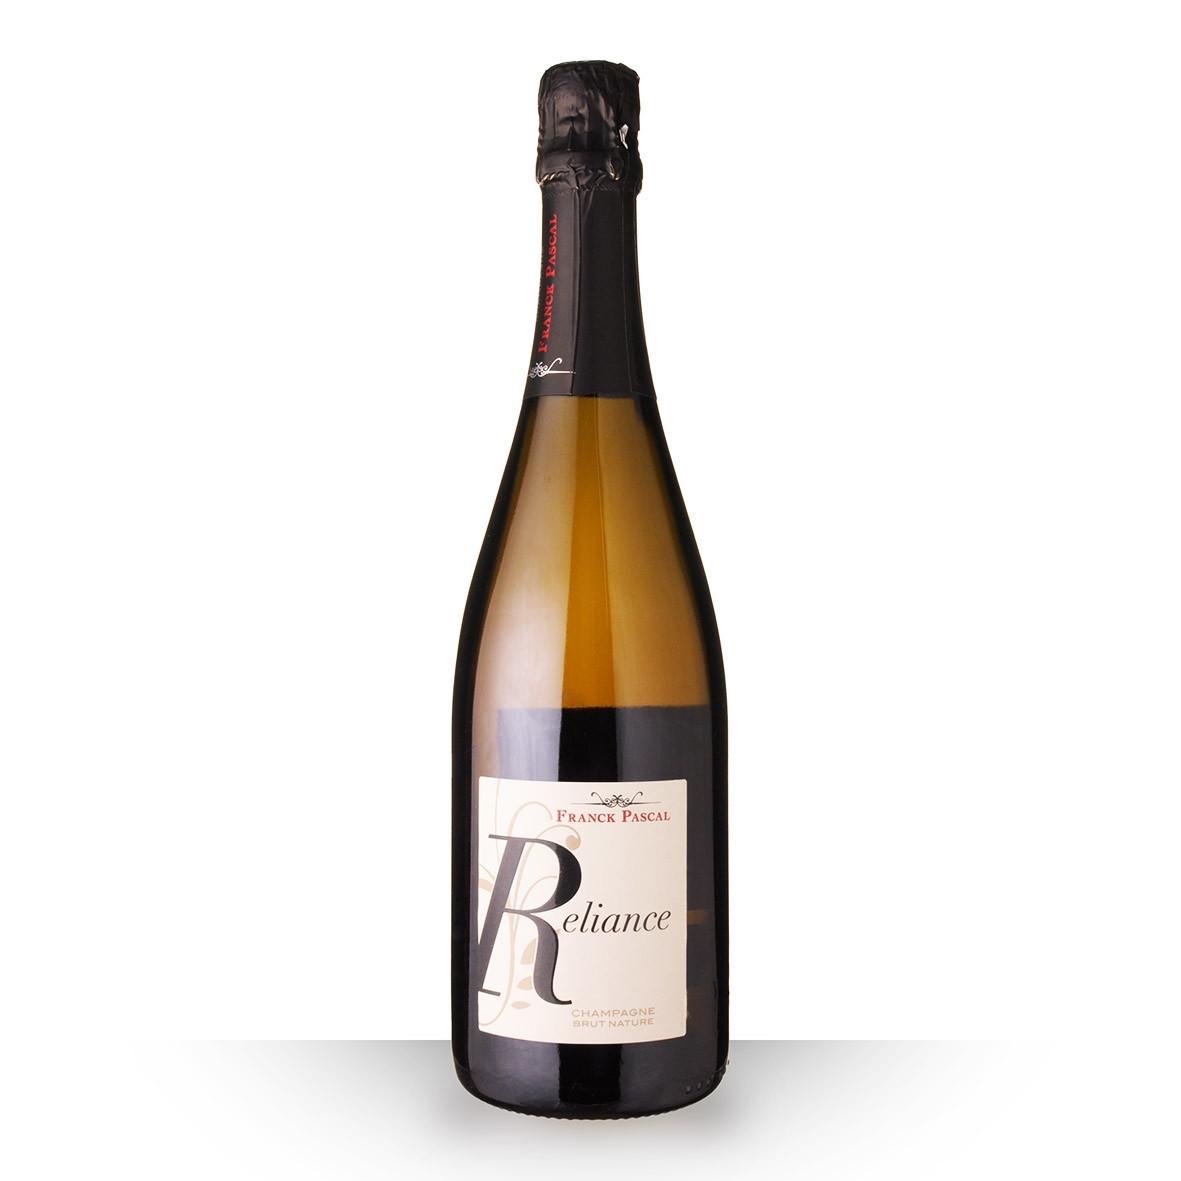 Champagne Franck Pascal Reliance Brut Nature 75cl www.odyssee-vins.com